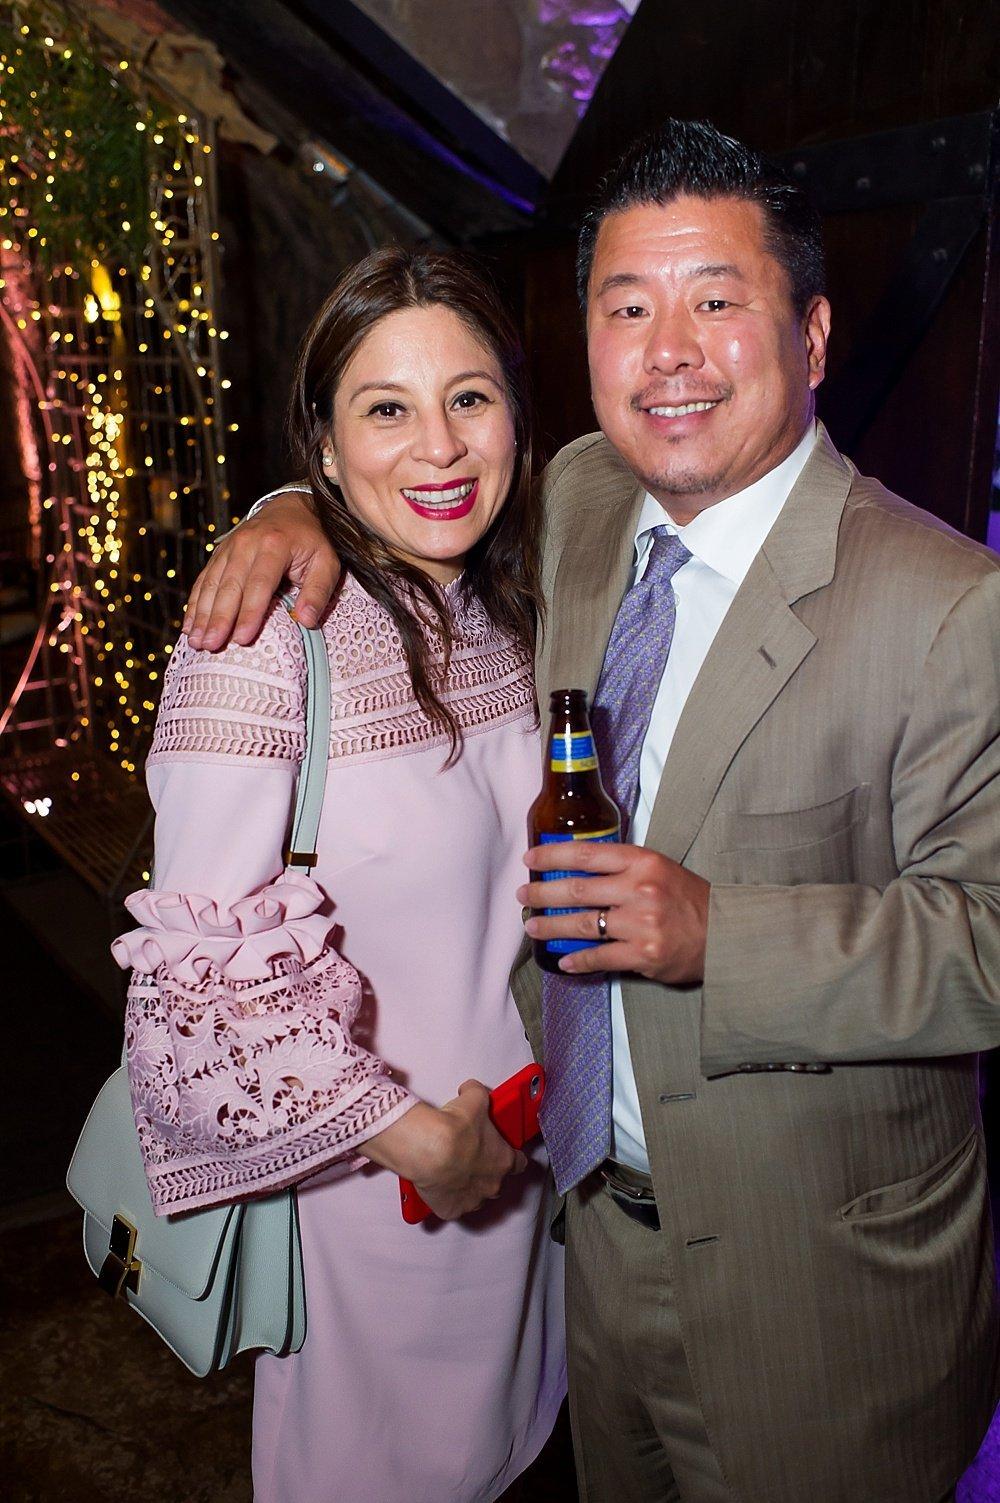 Familiar couple alert at hans fahden winery wedding